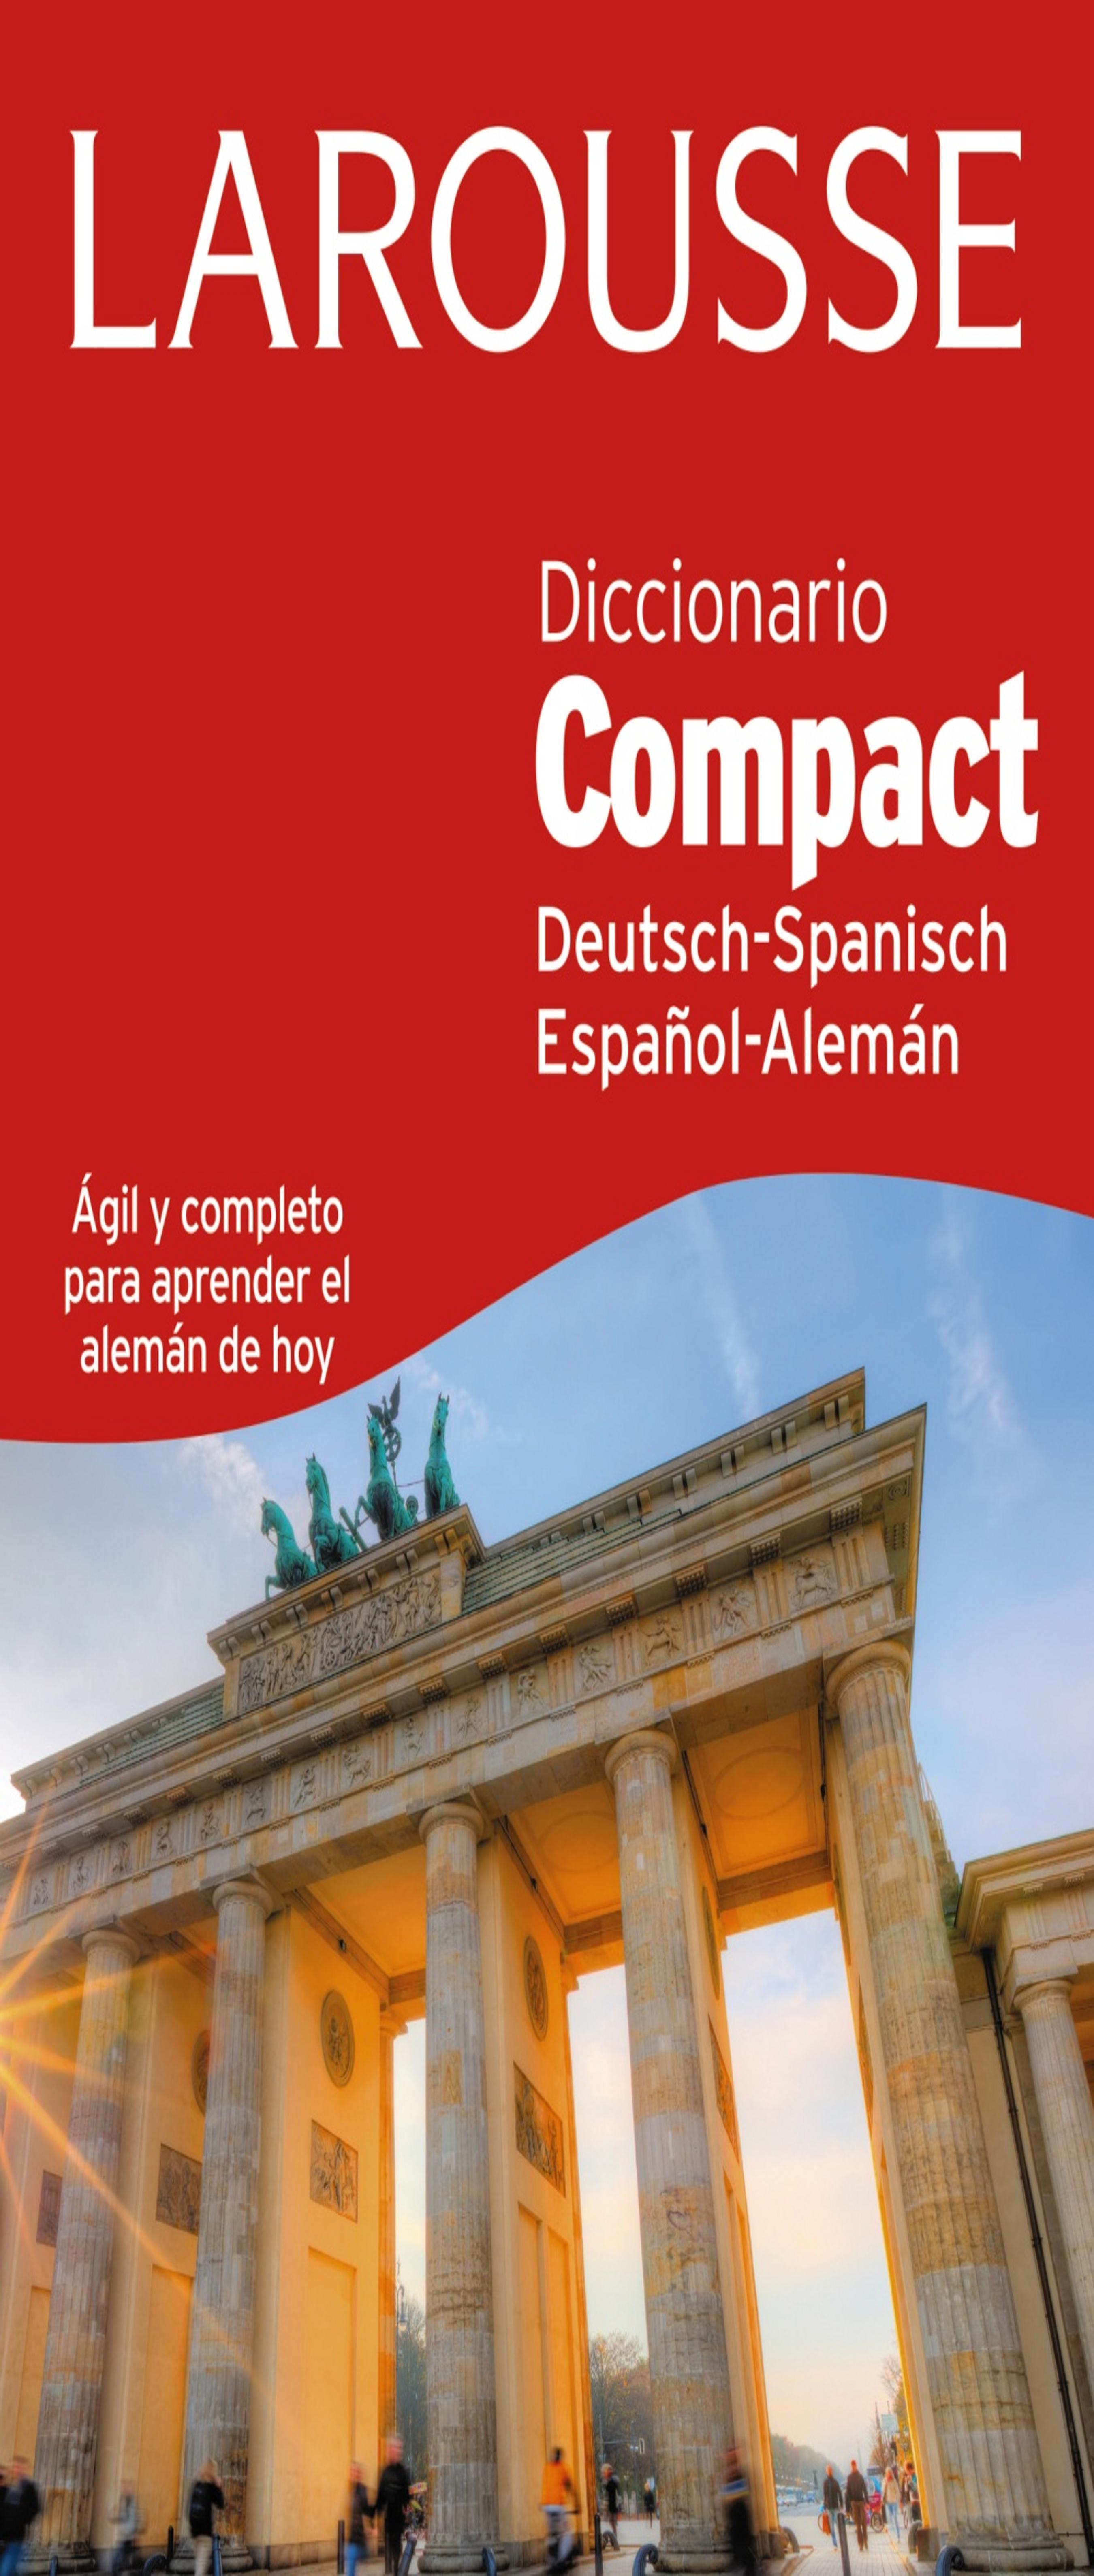 DICC Larousse COMPACT Alemán - Español / Español - Alemán